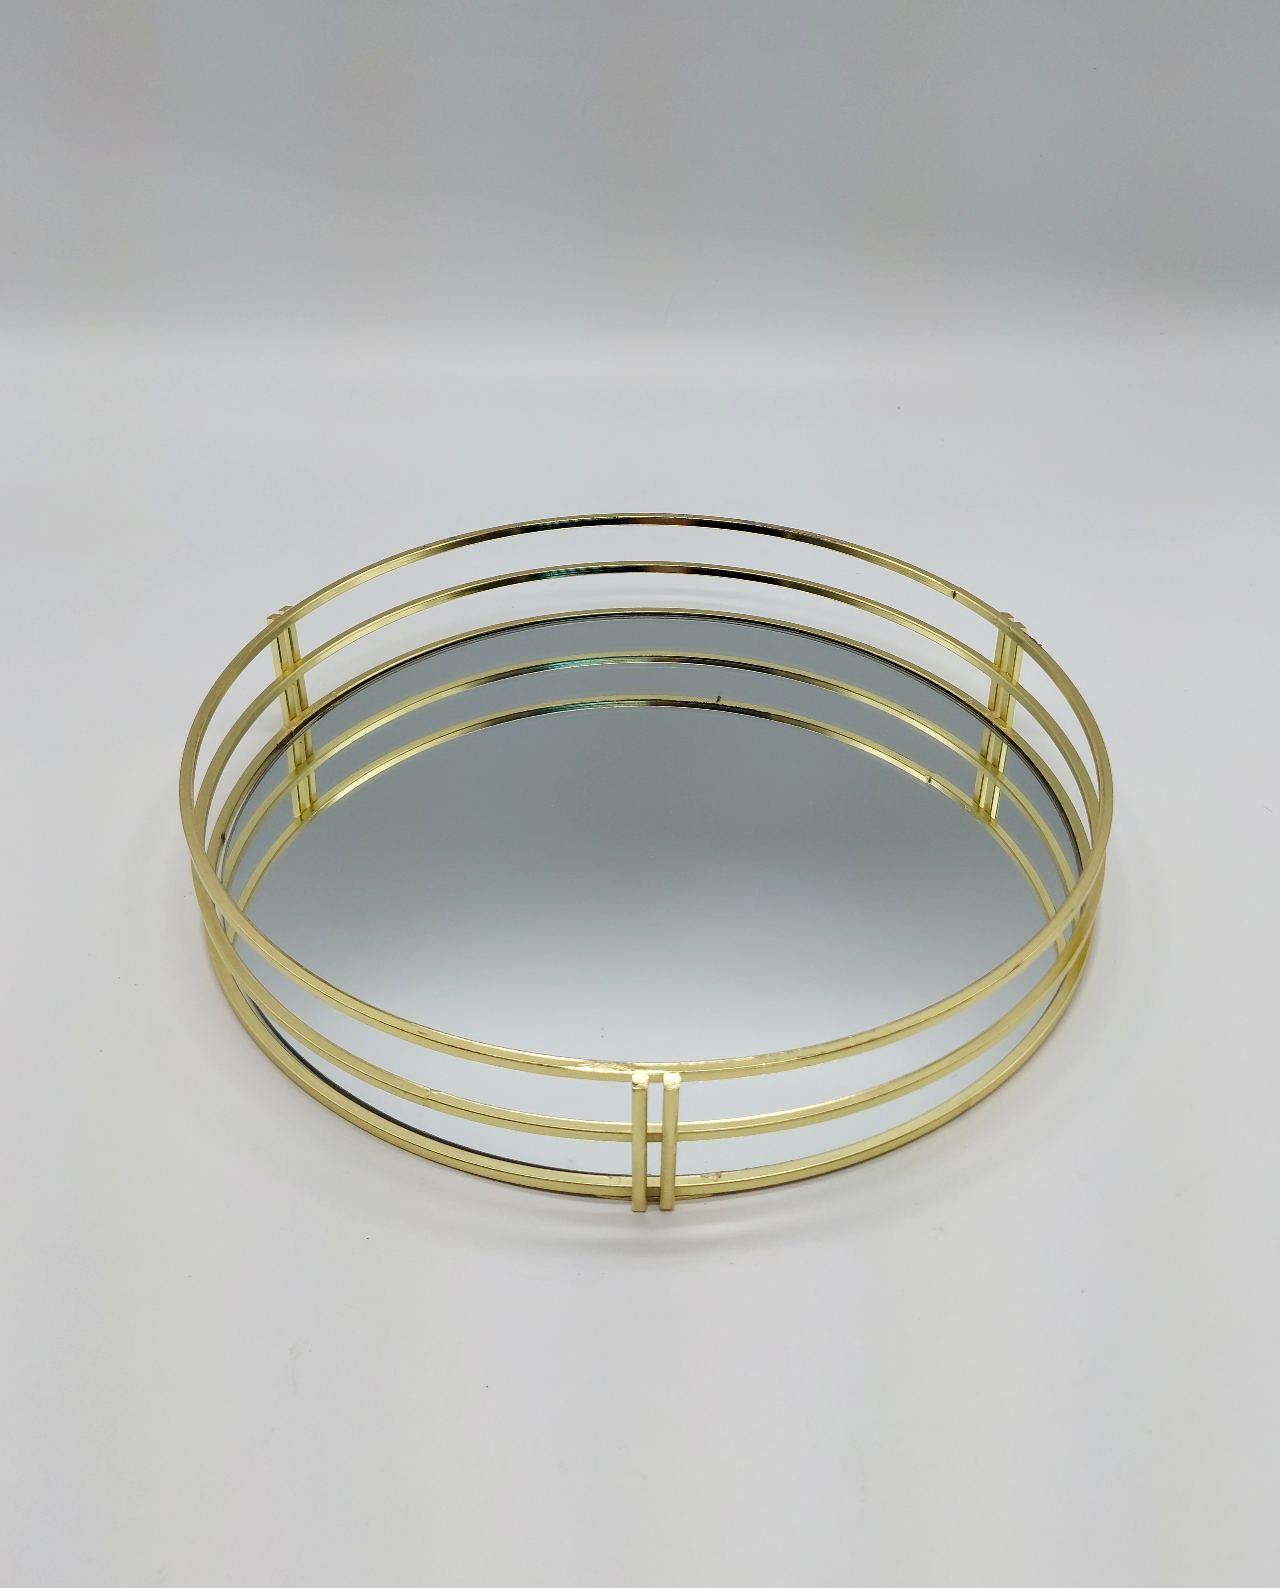 Tray Round Metal Gold Mirror Diameter 30 cm